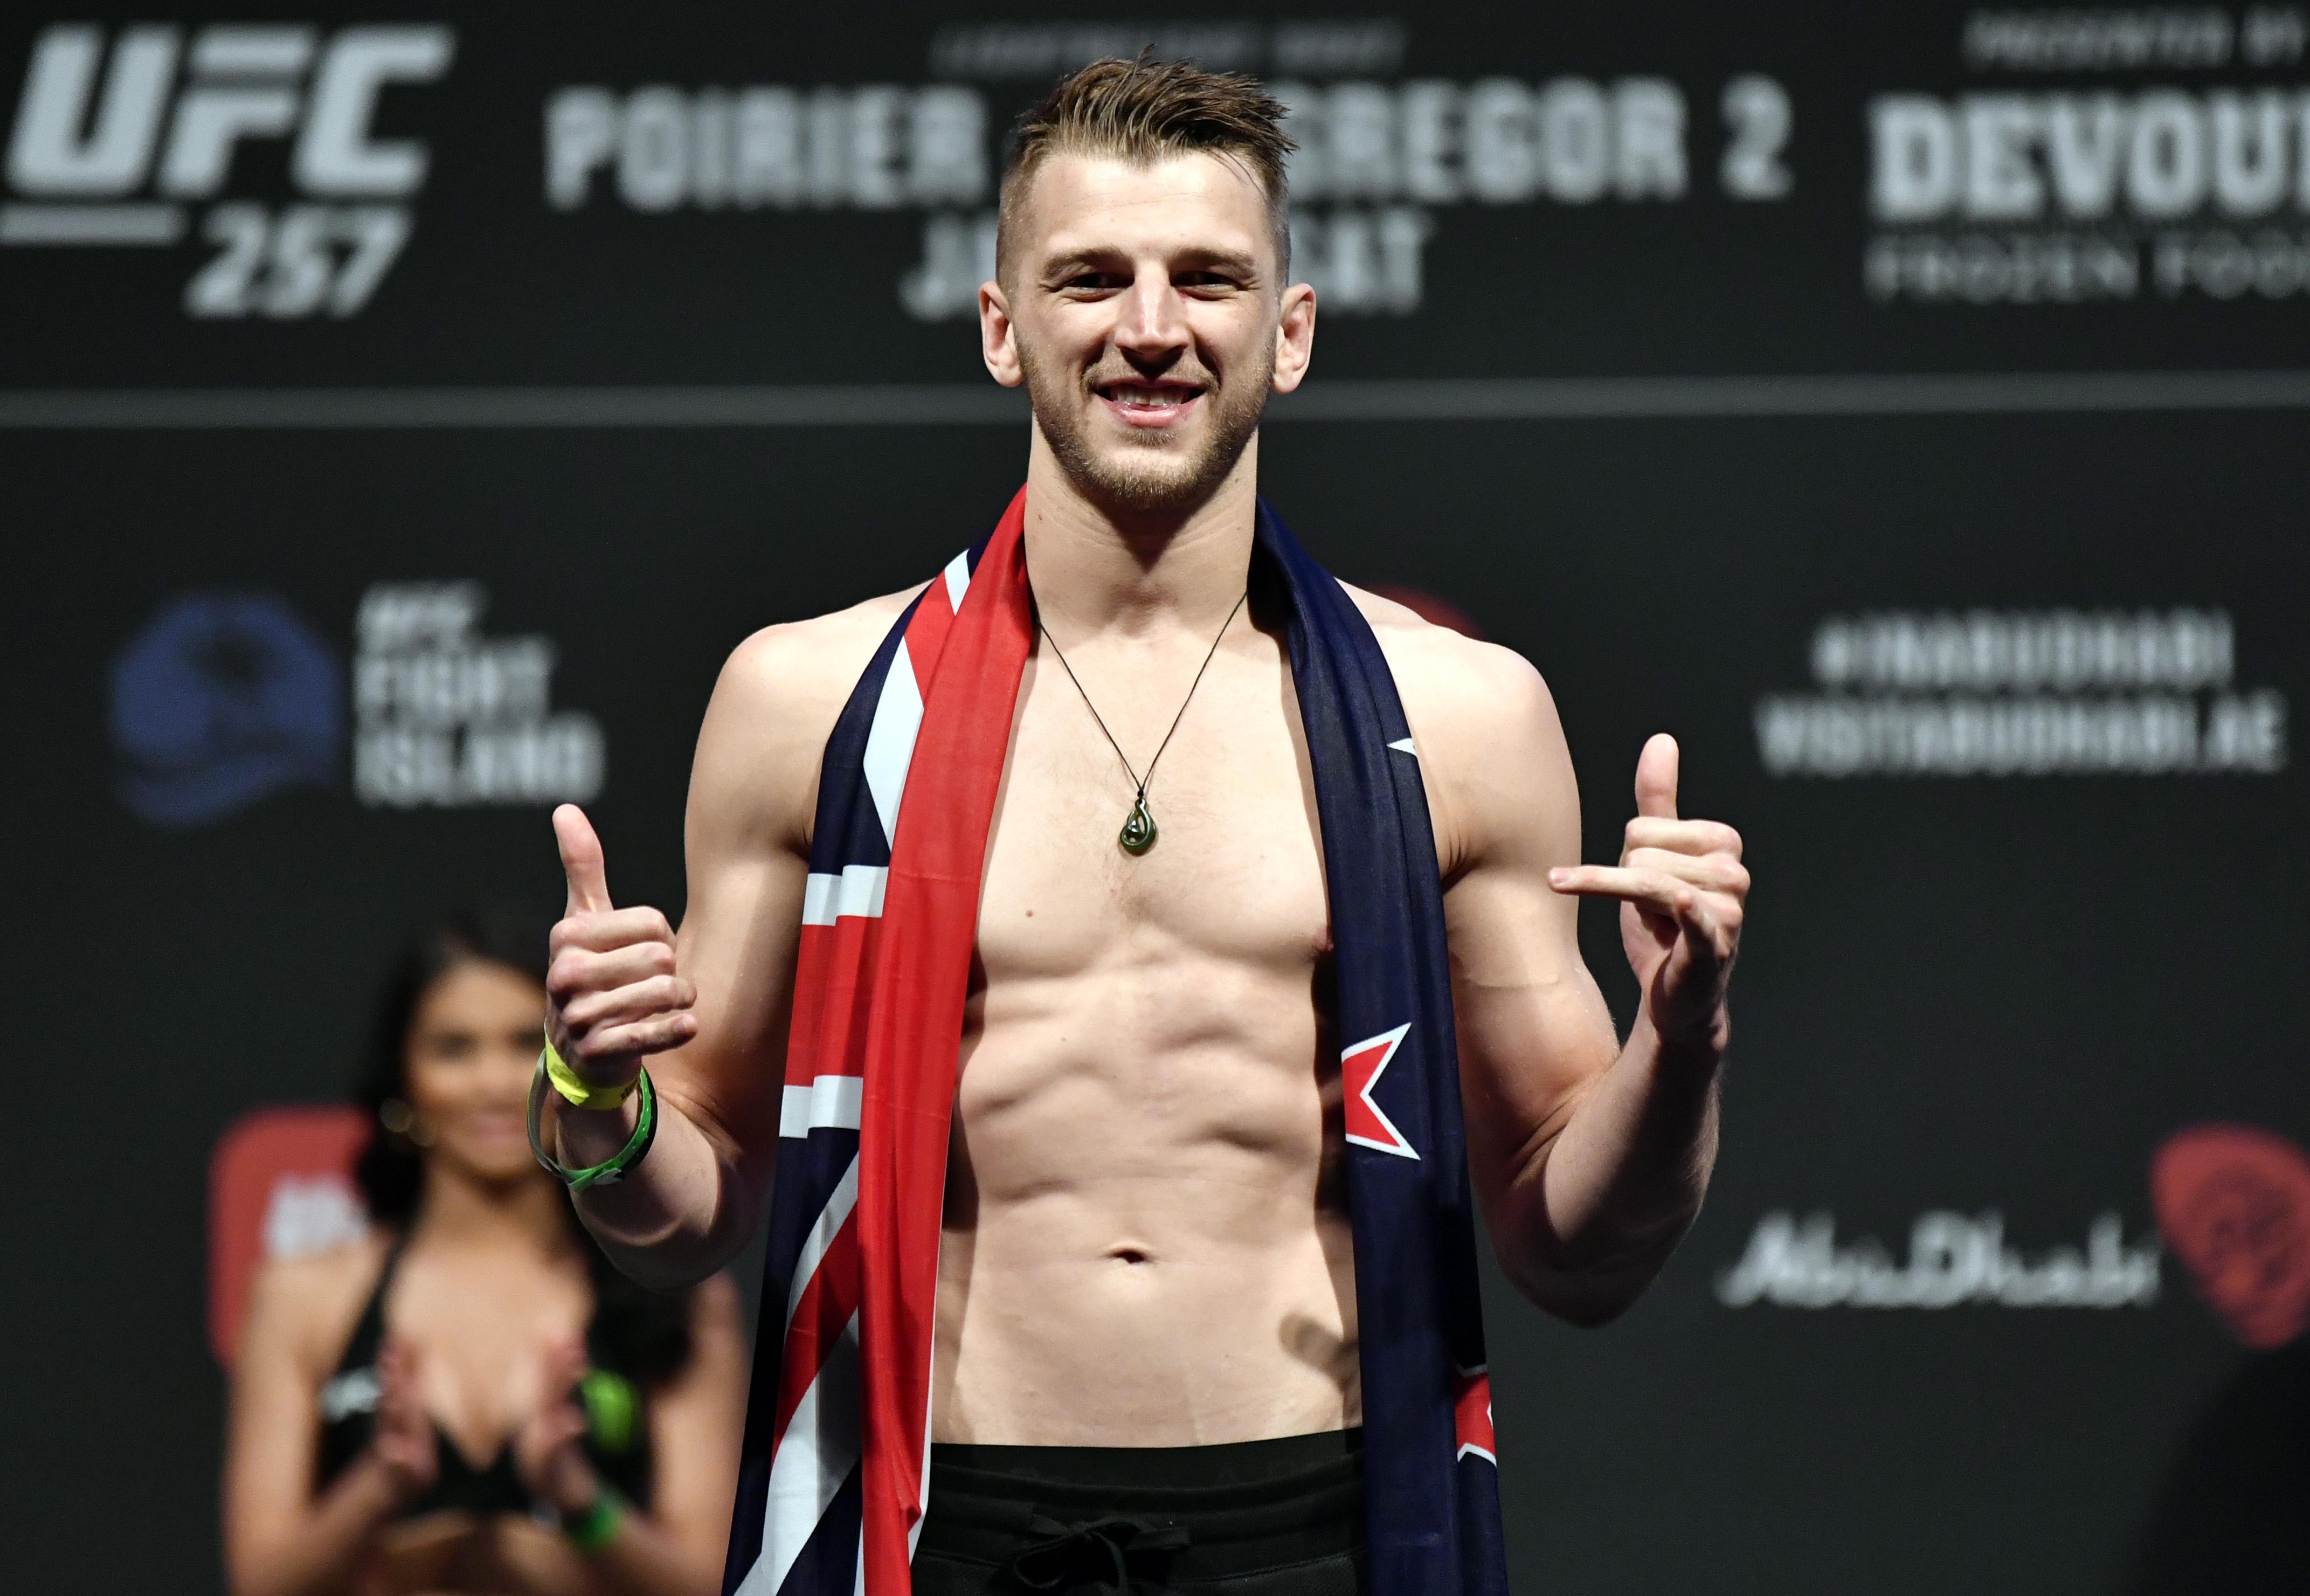 Dan Hooker during weigh-ins for UFC 257.